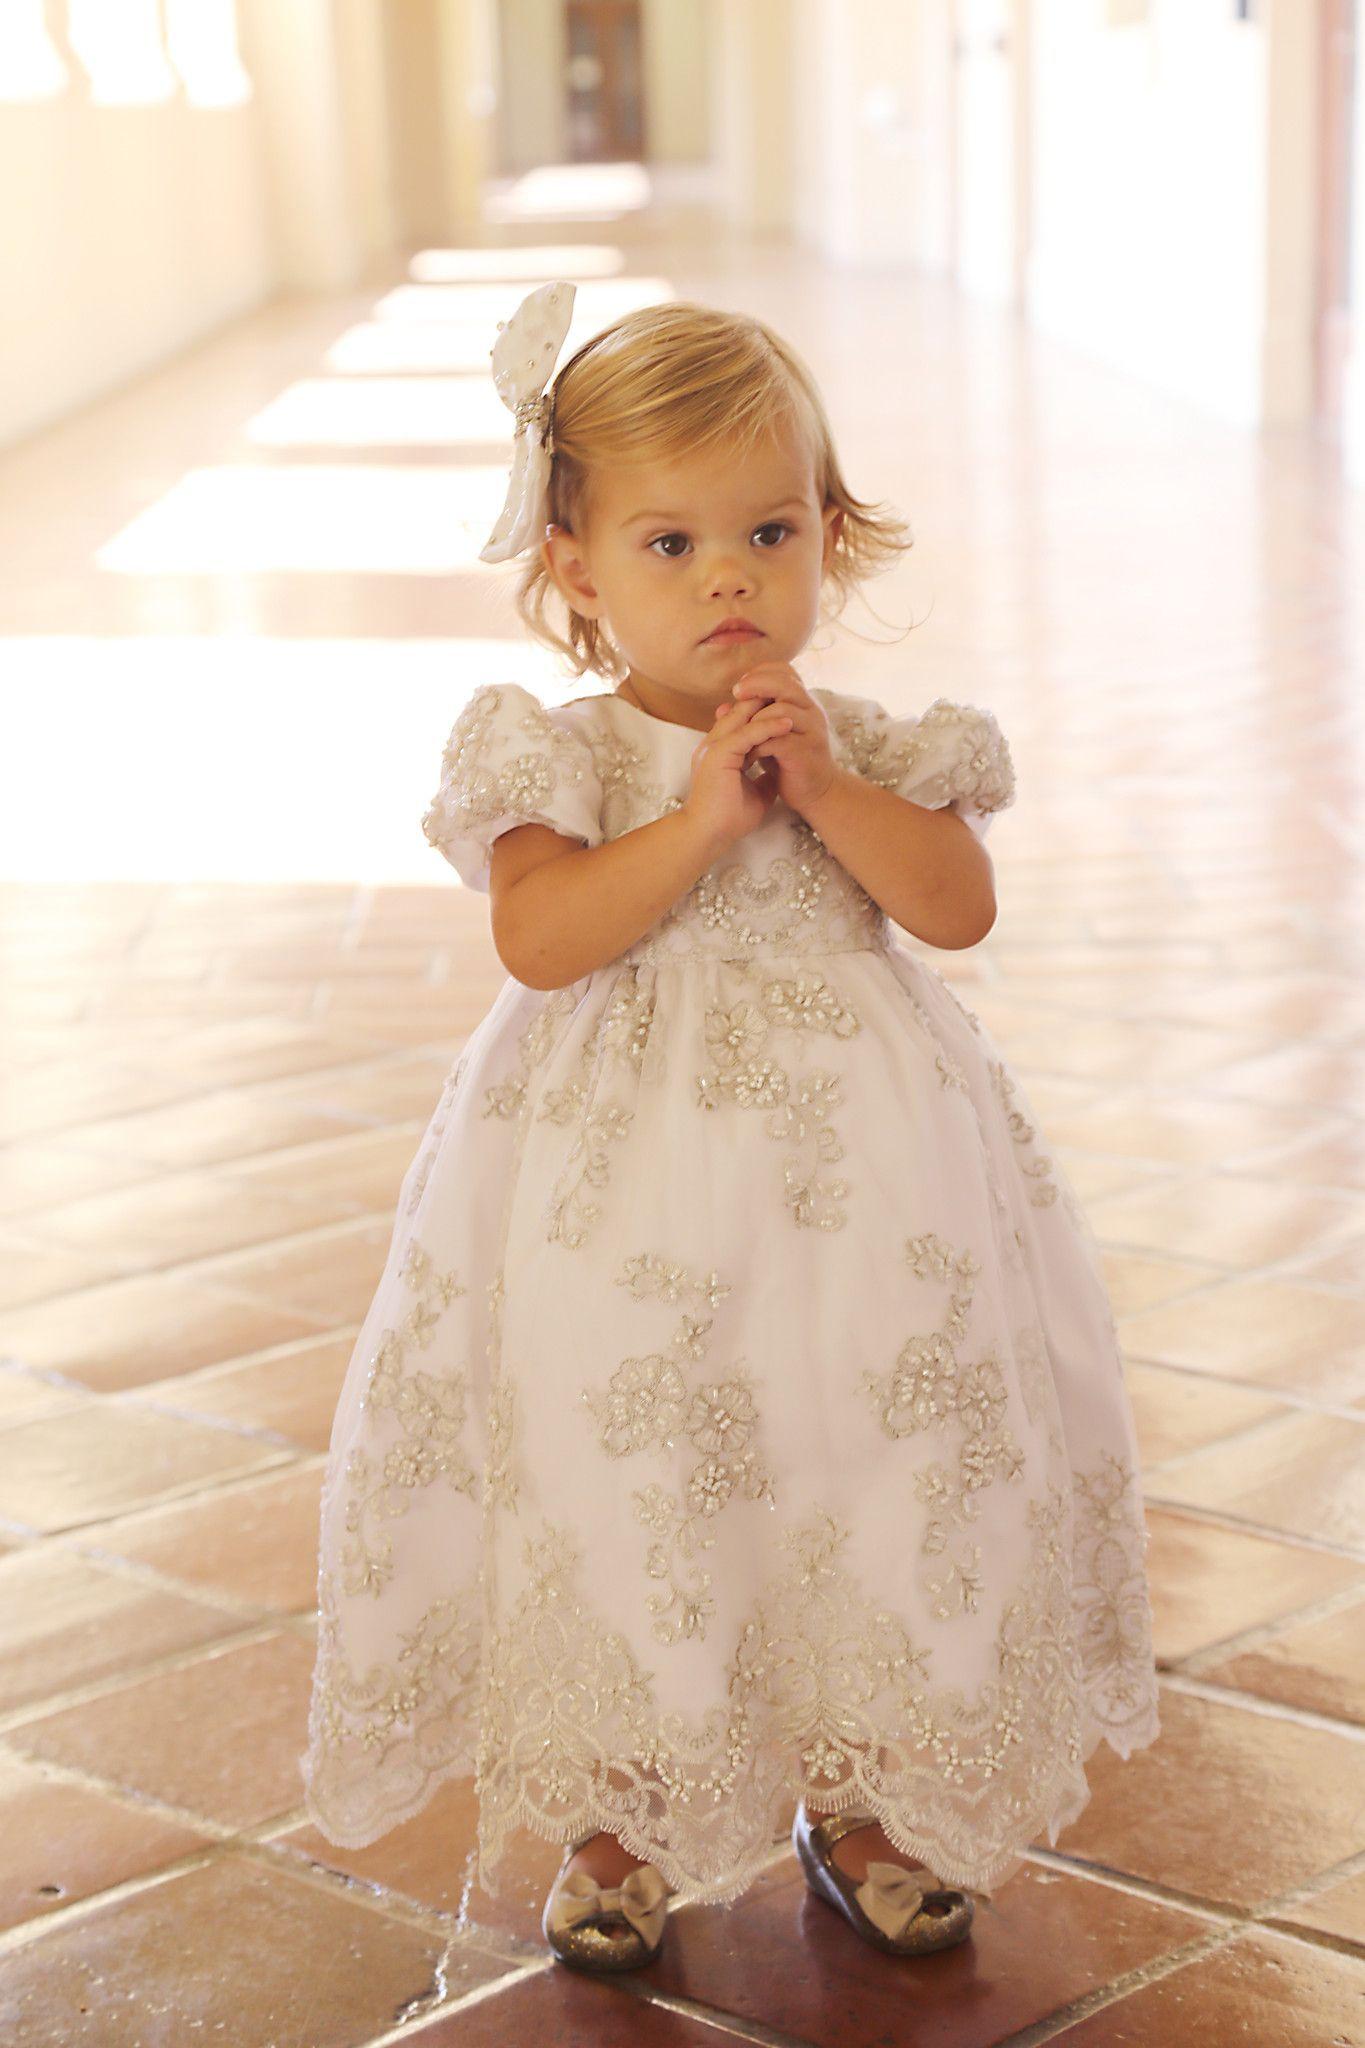 Lace dress for baby girl  Christening lace dressbaby girl baptismdressflower girlLeonora